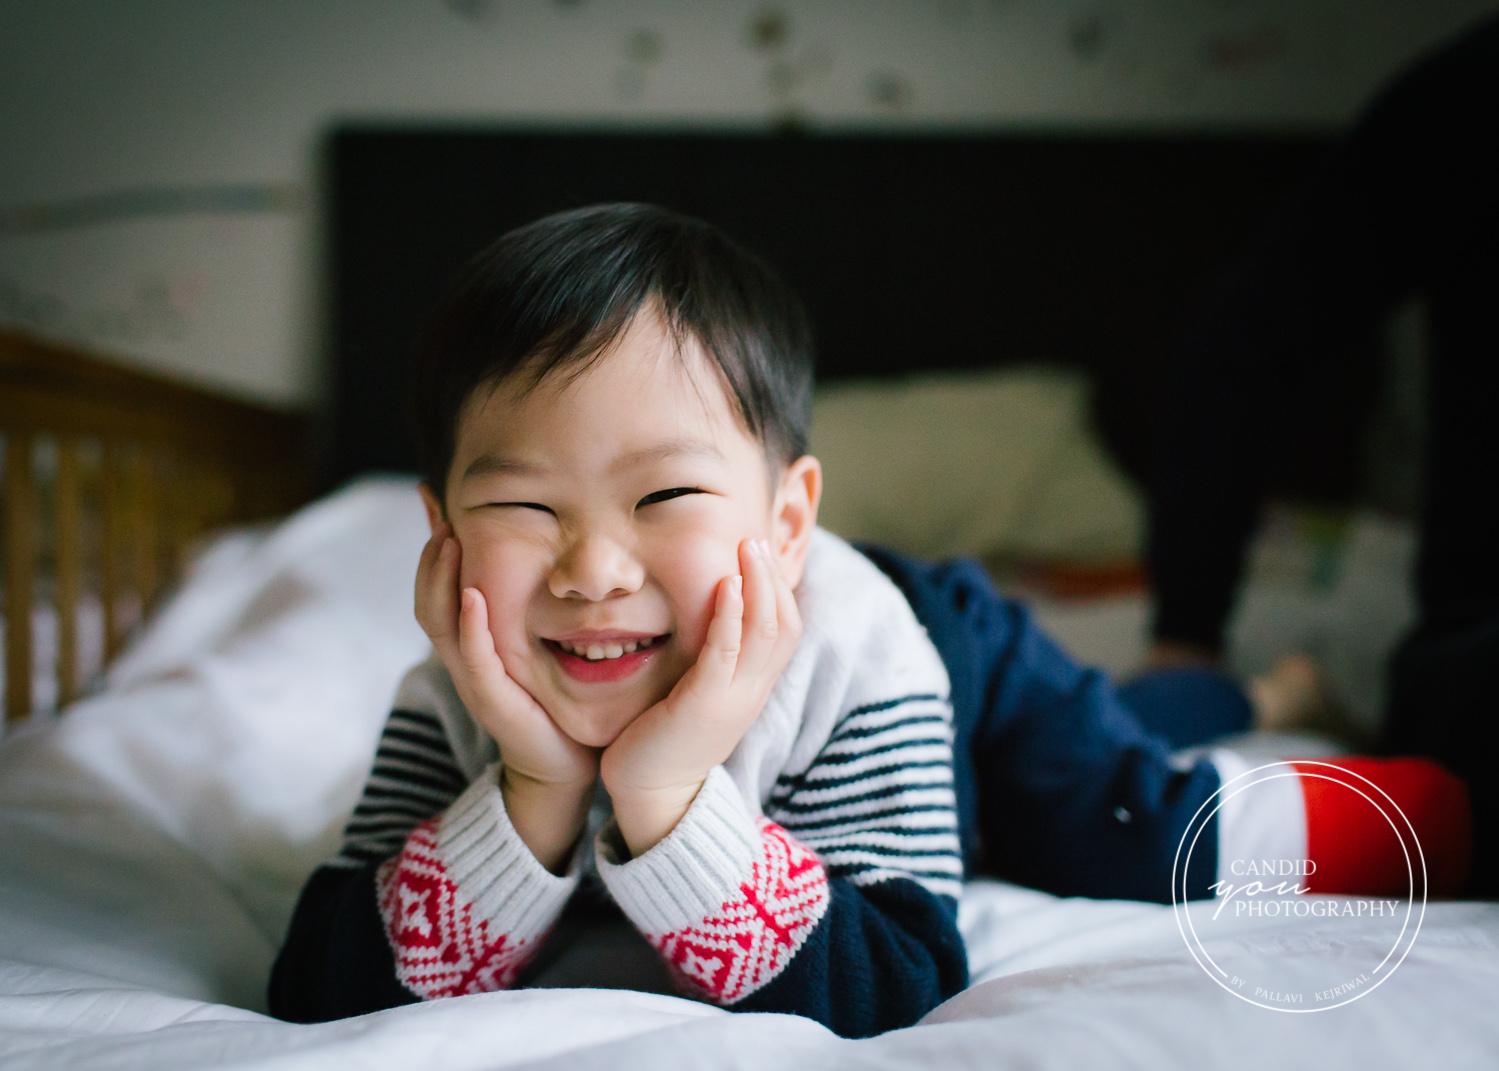 Harborne Asian Boy smiling